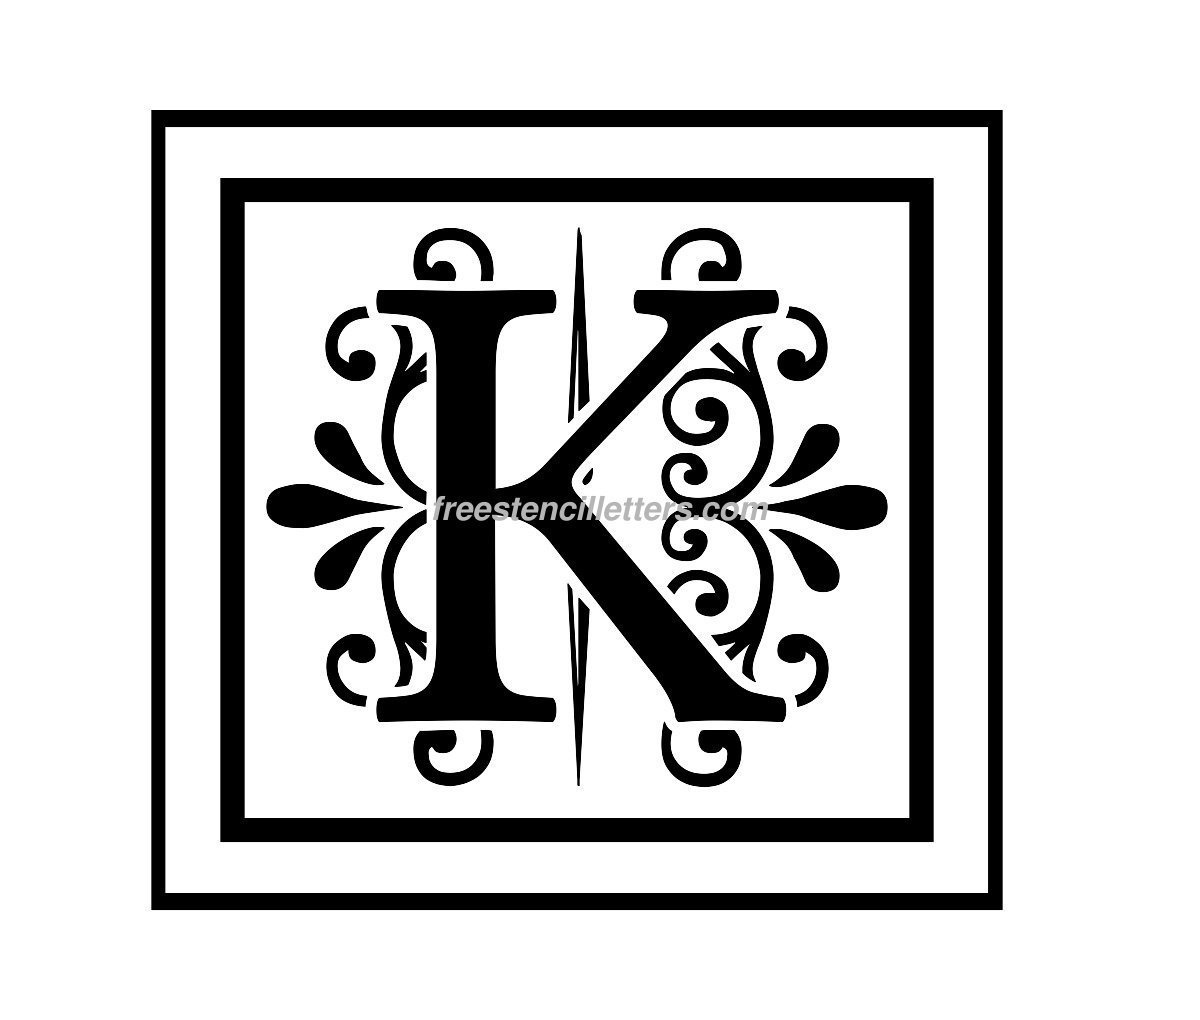 Print K Letter Stencil - Free Stencil Letters - Online Letter Stencils Free Printable